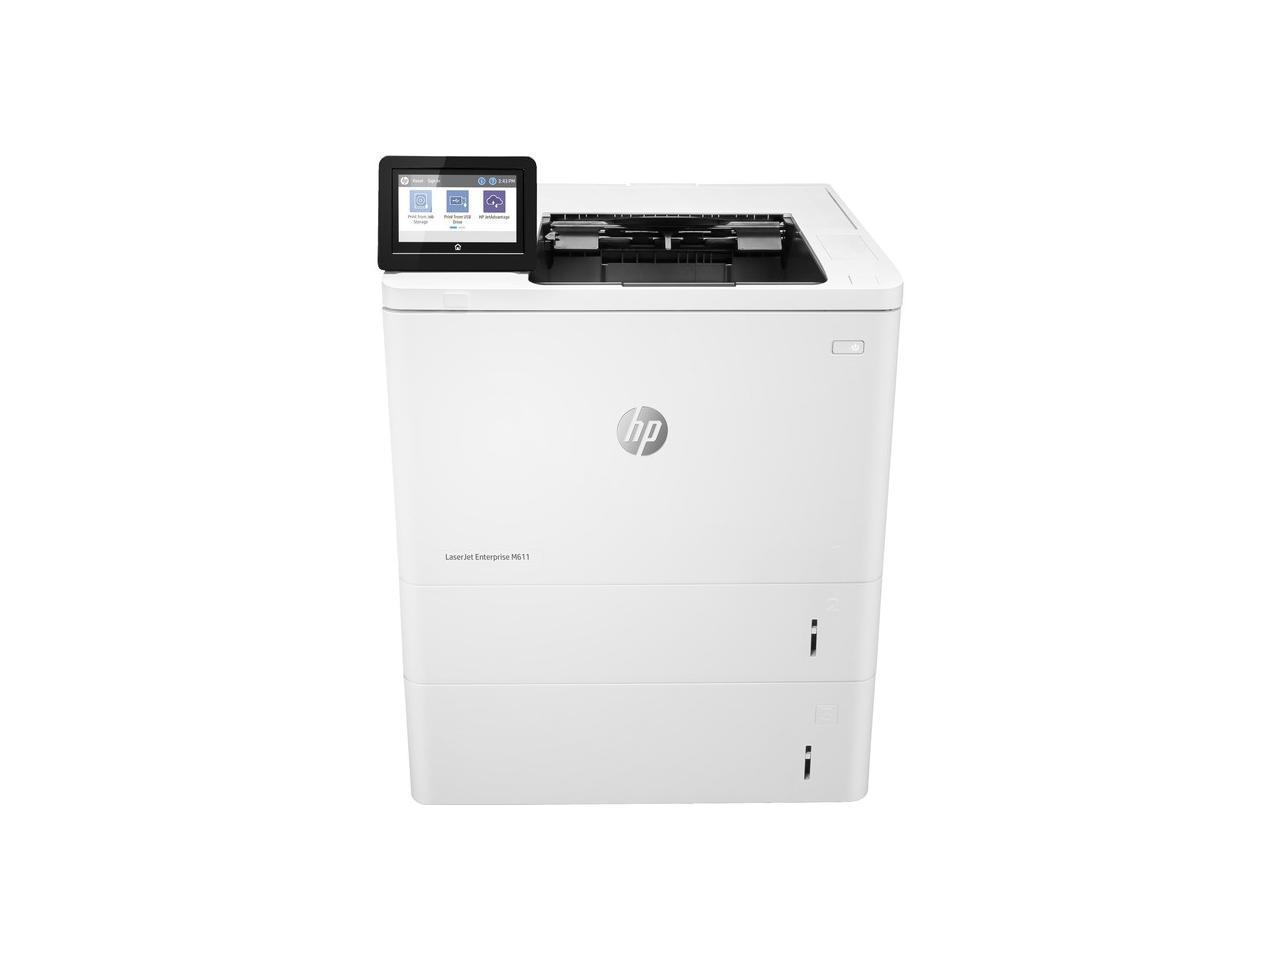 HP LASERJET M611X  7PS85A Duplex Network WIFI 2nd tray L0H17A - $1,469.99